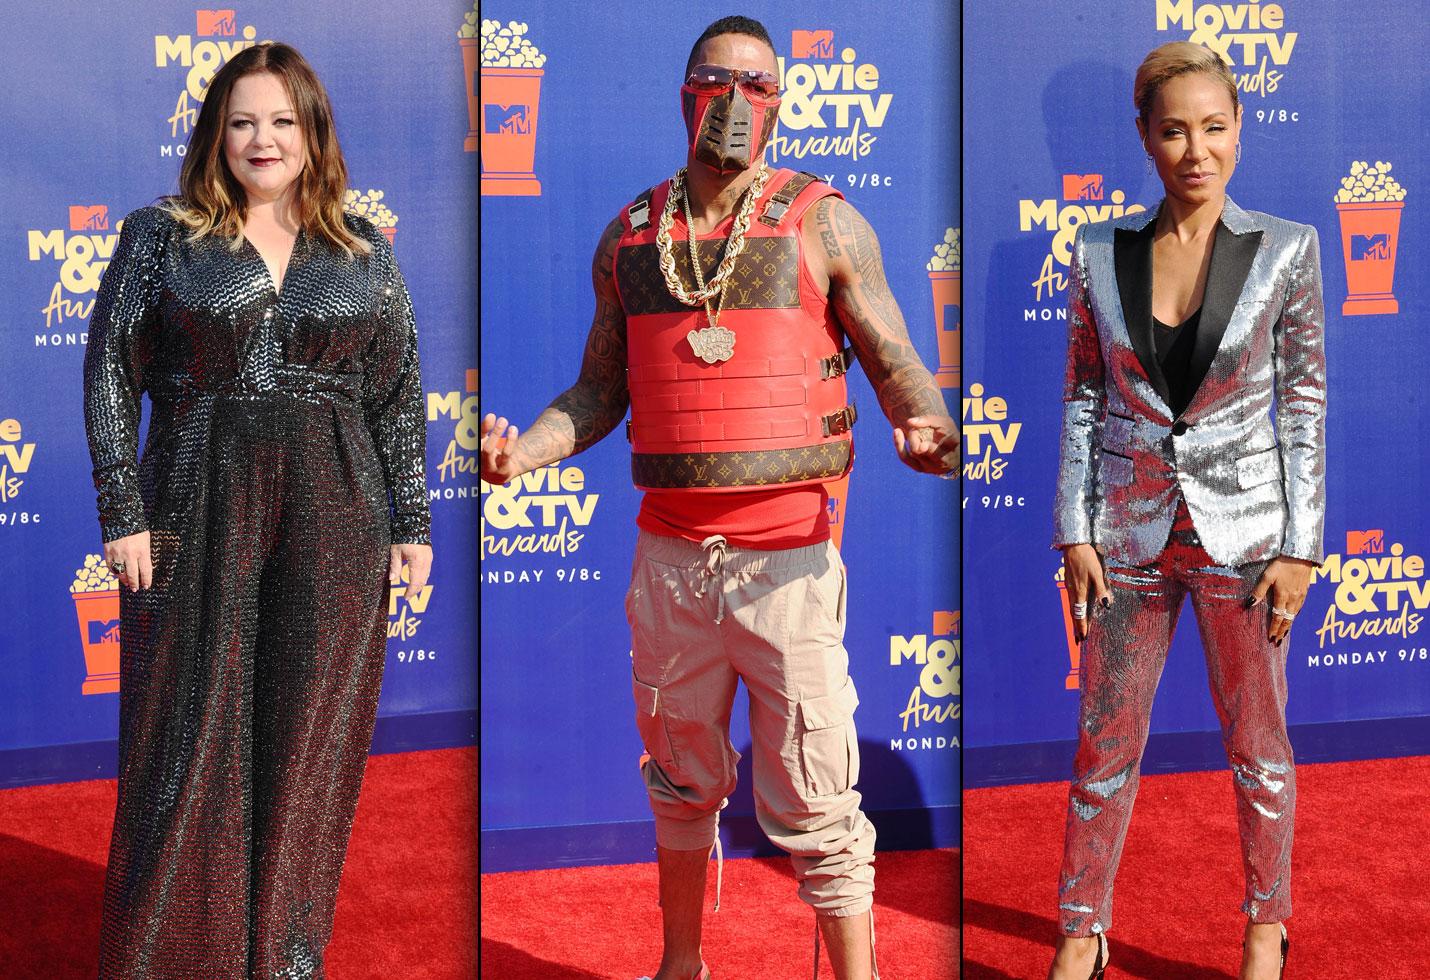 Mtv movie tv awards 2019 red carpet Melissa McCarthy, Nick Cannon and Jada Pinkett Smith